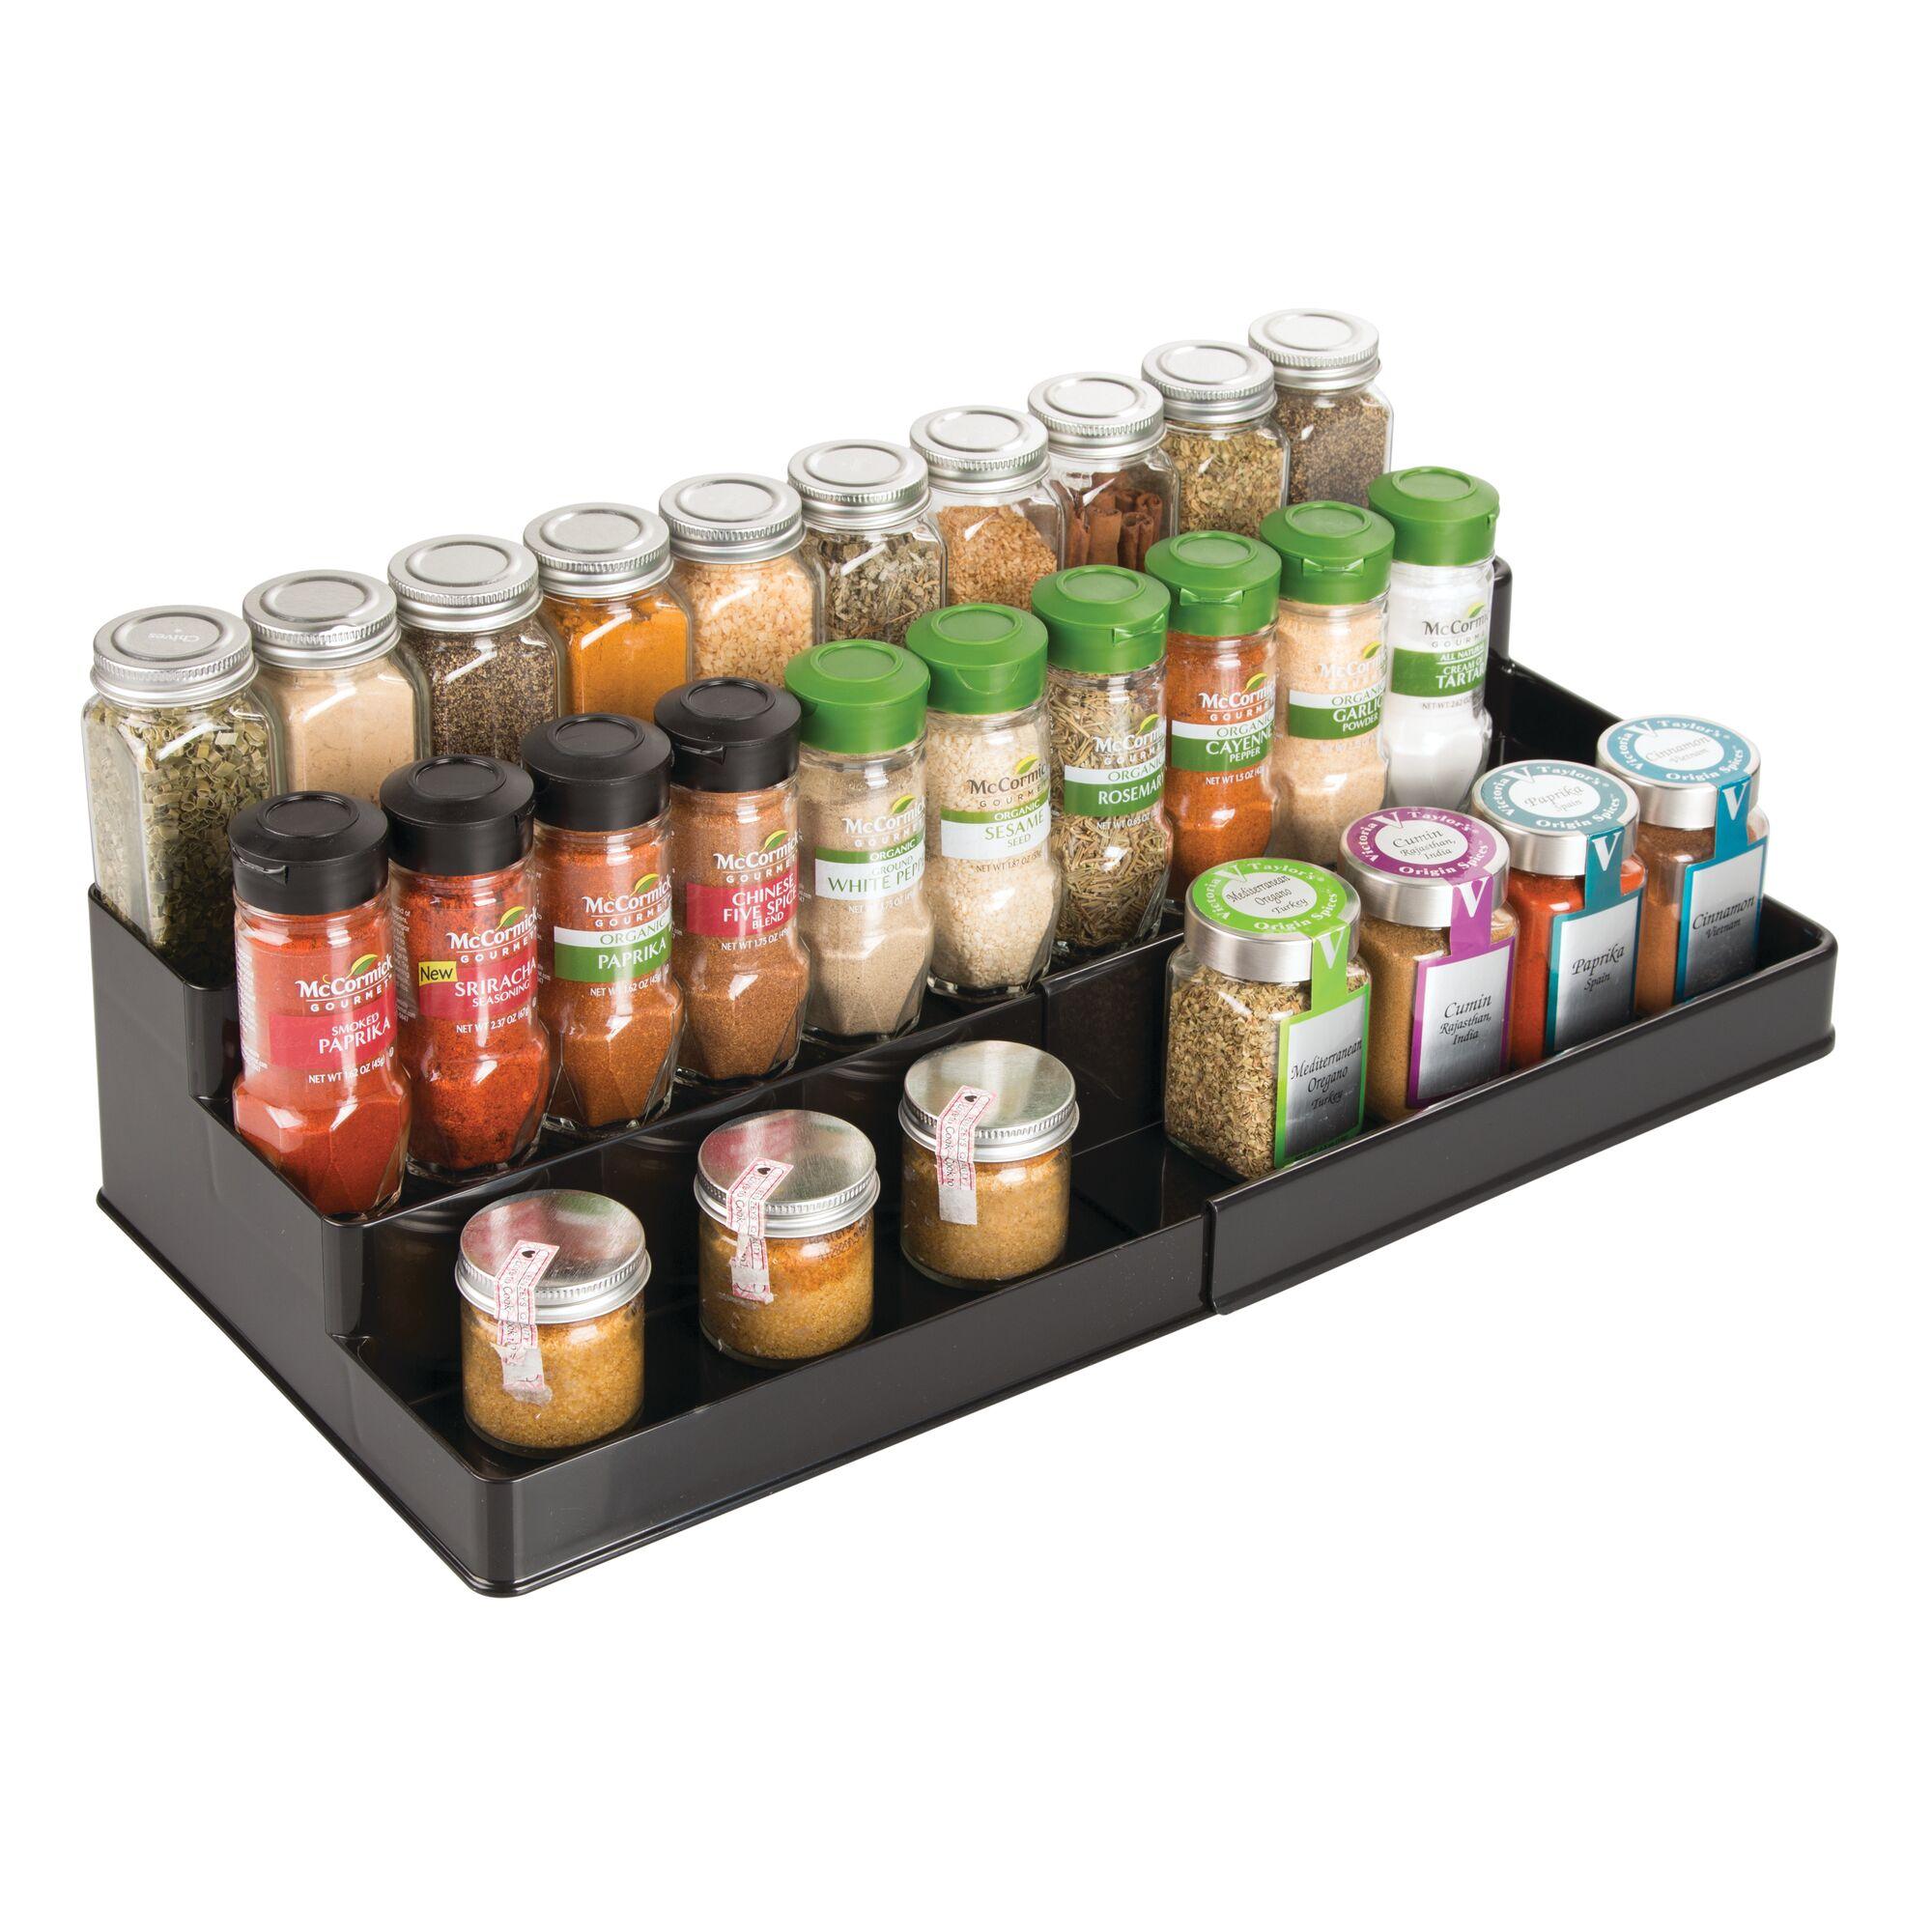 mDesign-Expandable-Kitchen-Cabinet-Pantry-Organizer-Spice-Rack thumbnail 8